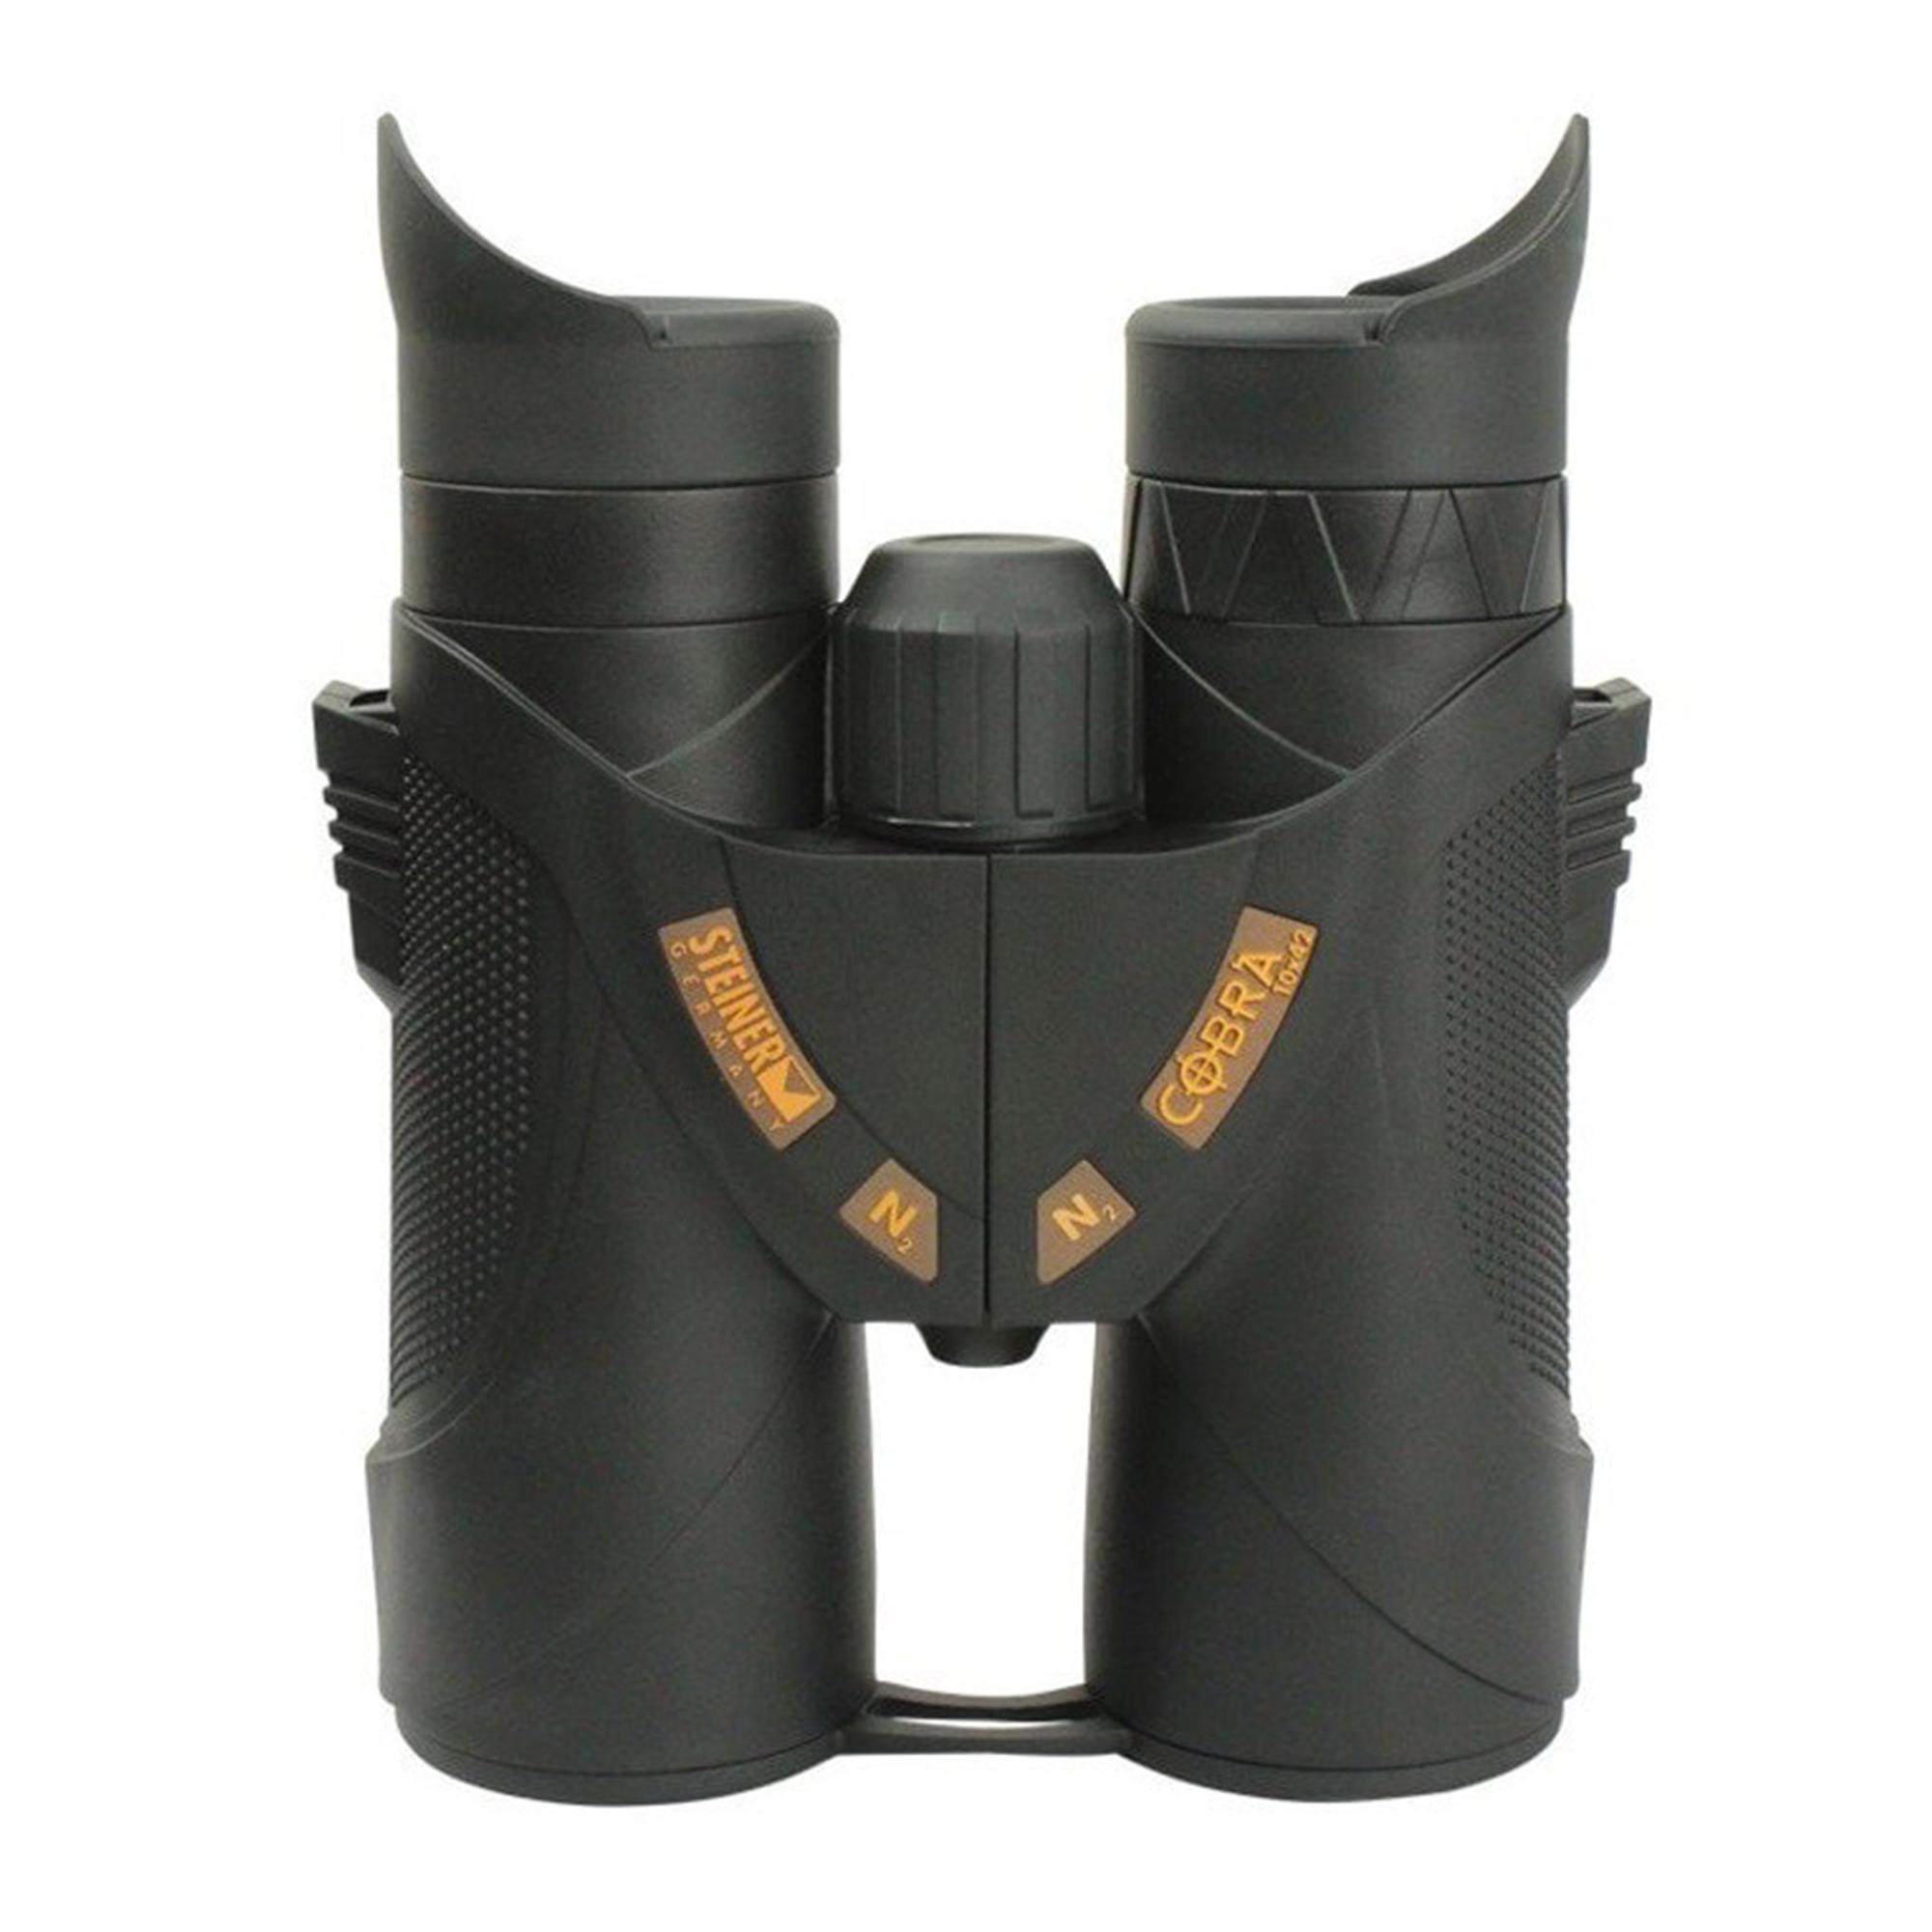 Steiner Cobra 8x42 Binocular (out of stock)